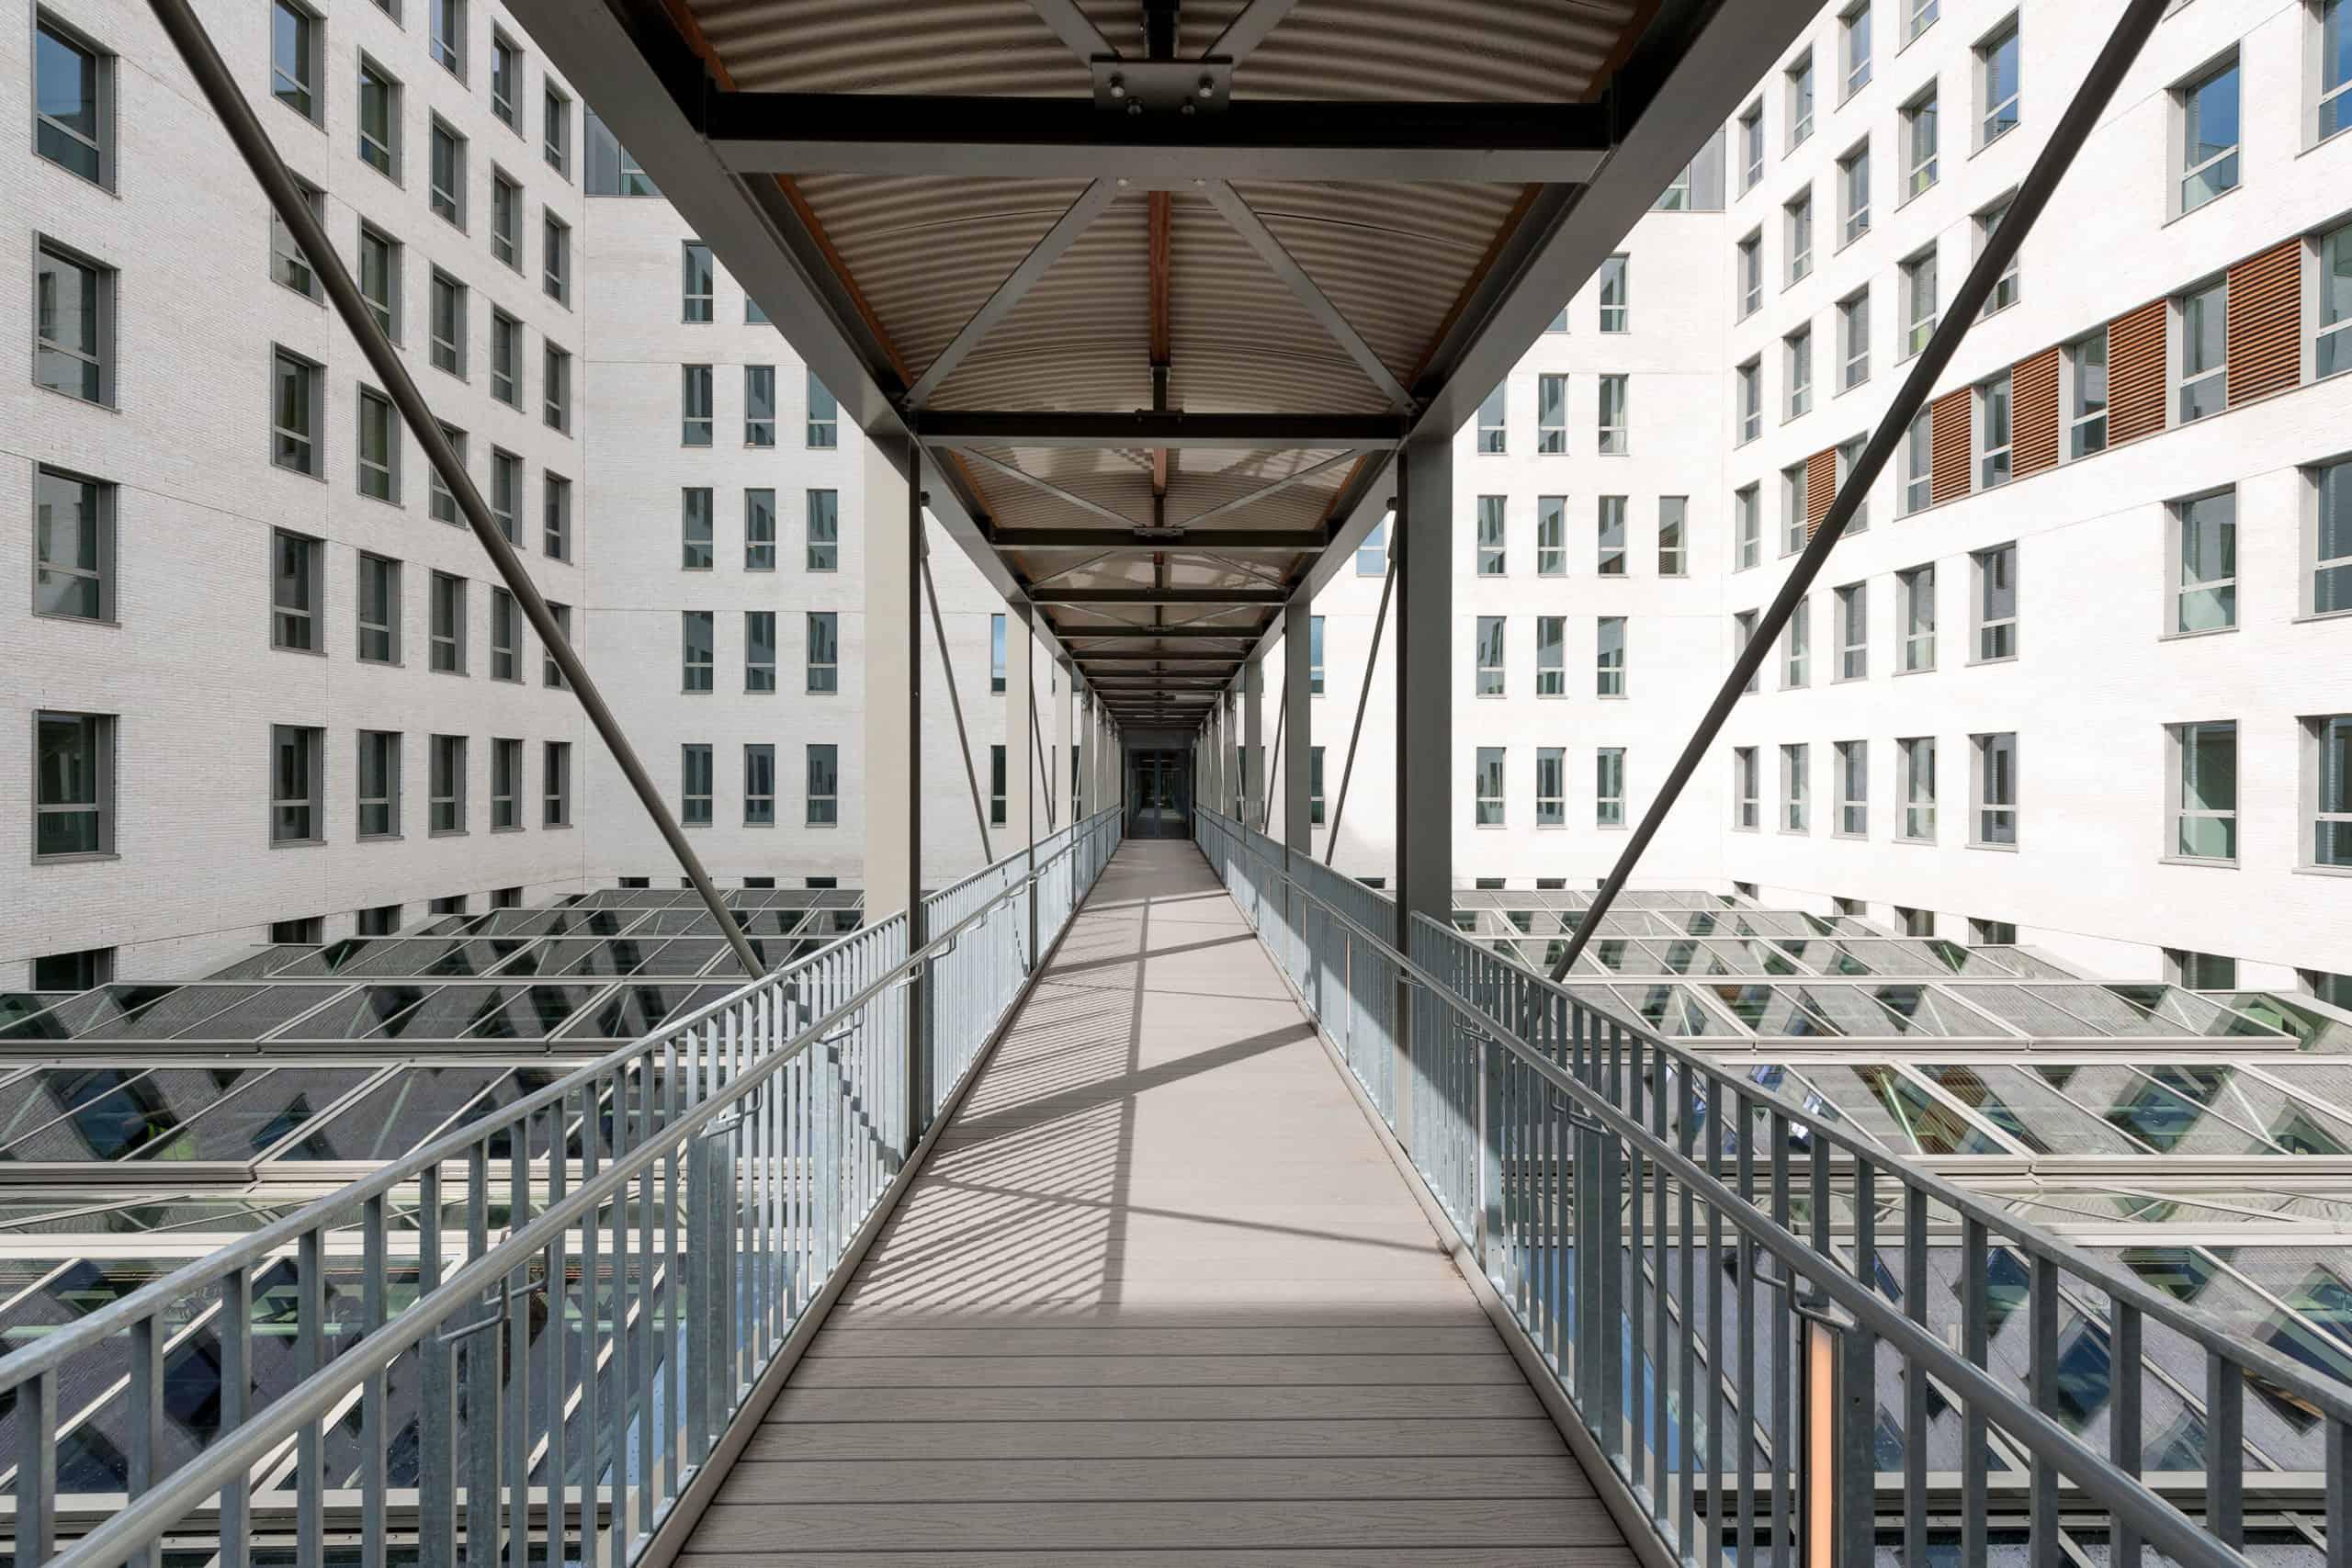 Meander-Medisch-Centrum-3-©-Dirk-Verwoerd-Atelier-Pro-2-scaled